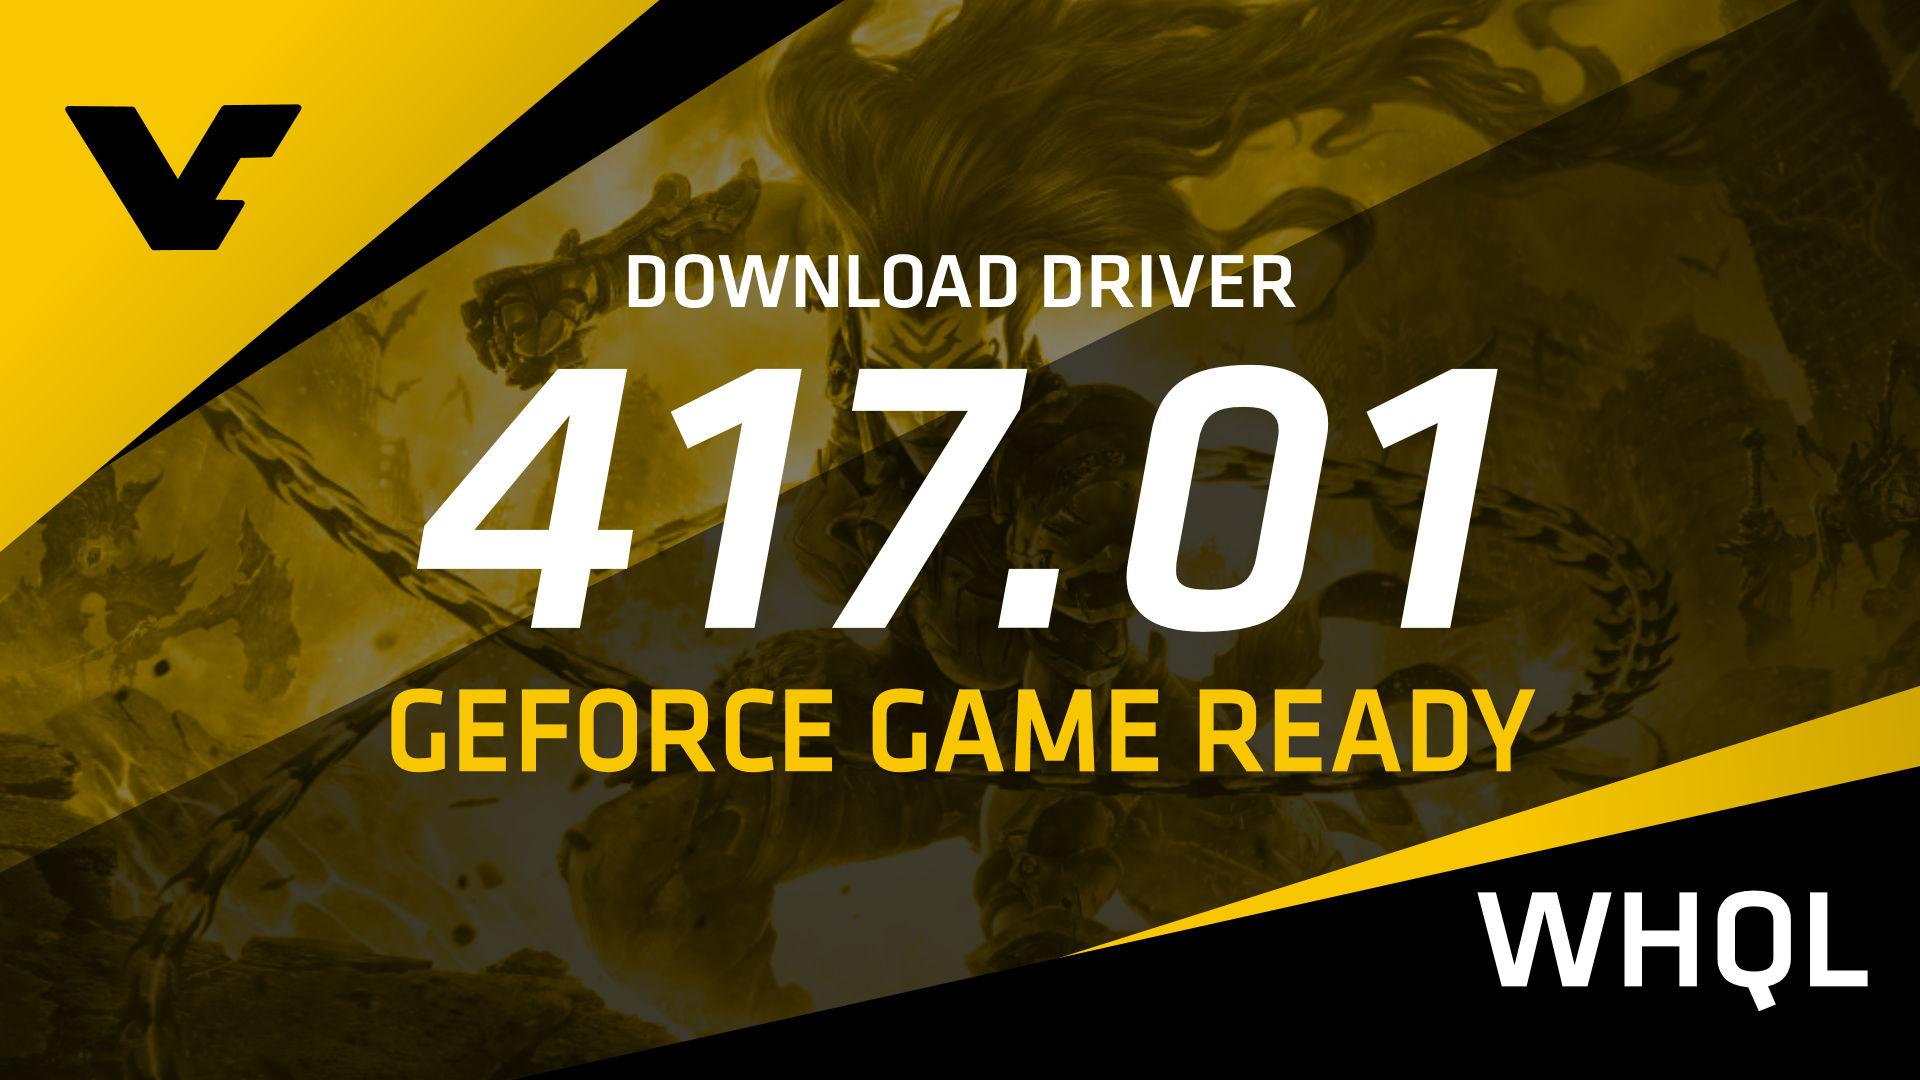 NVIDIA GeForce Game Ready 417 01 WHQL - VideoCardz com